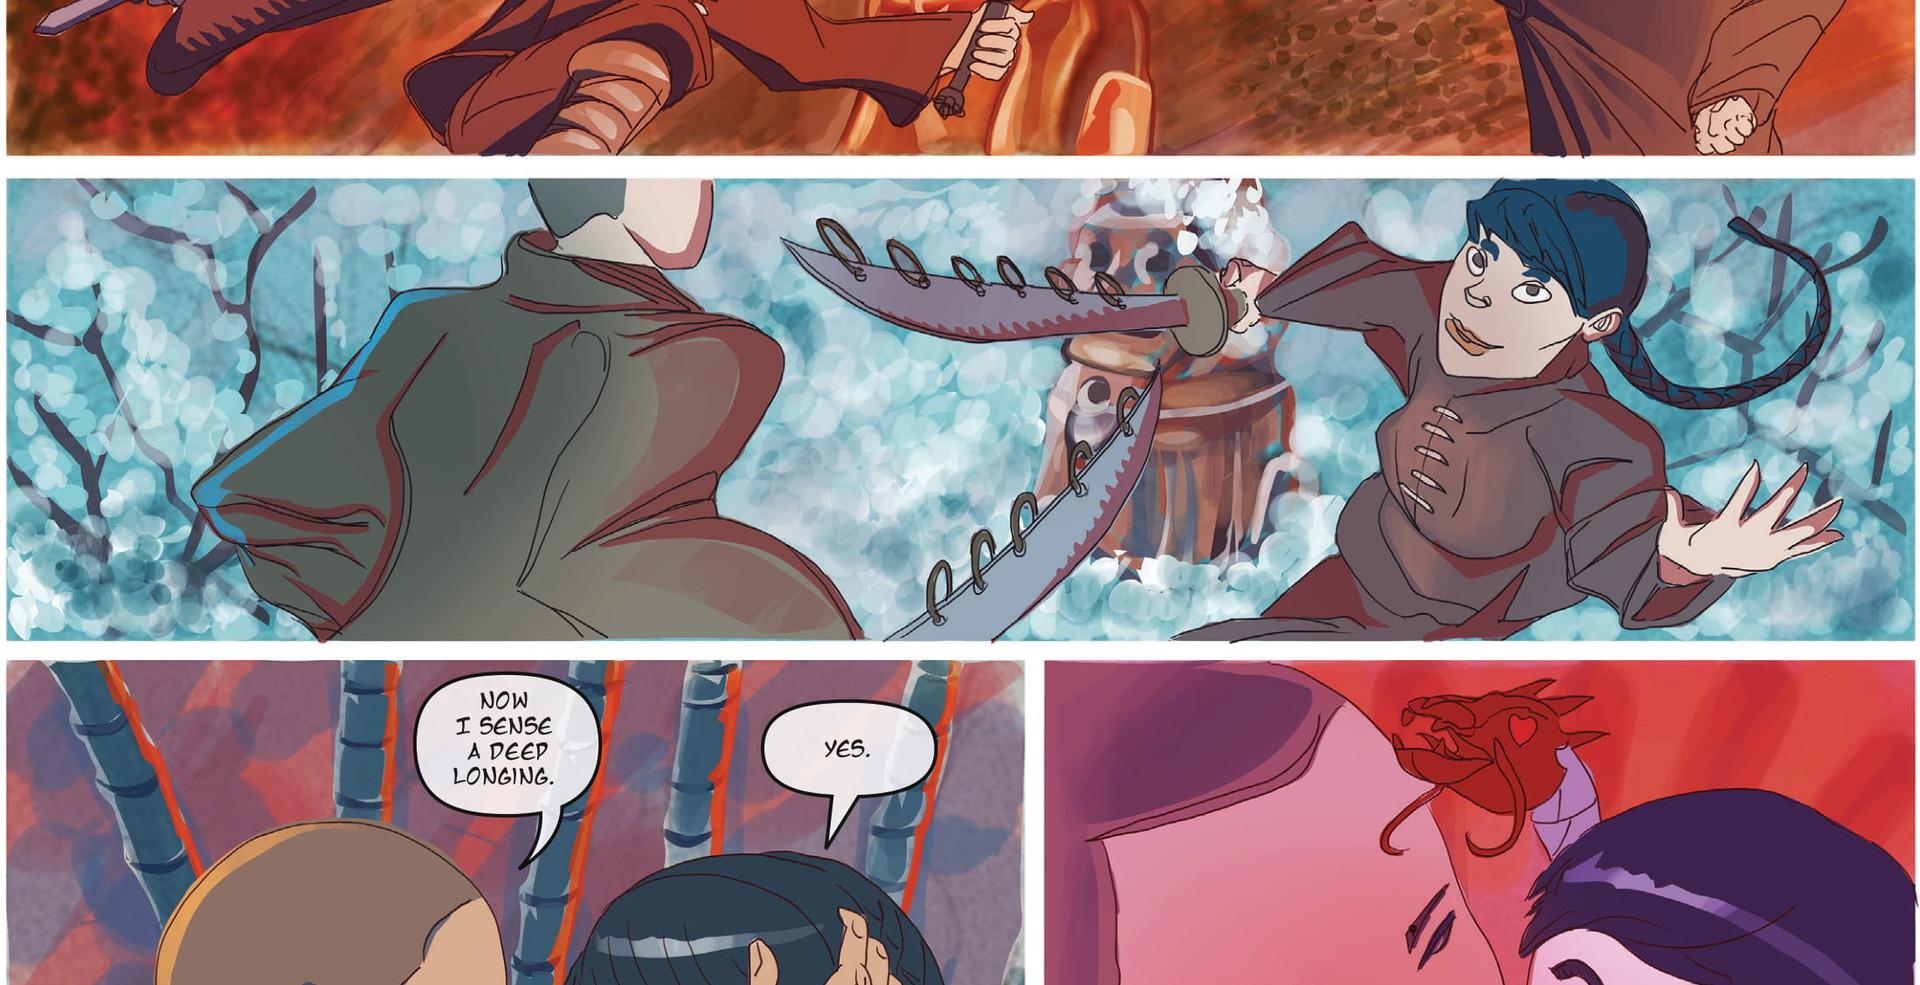 Cassandra comic (1) (1) (1)-08.jpg